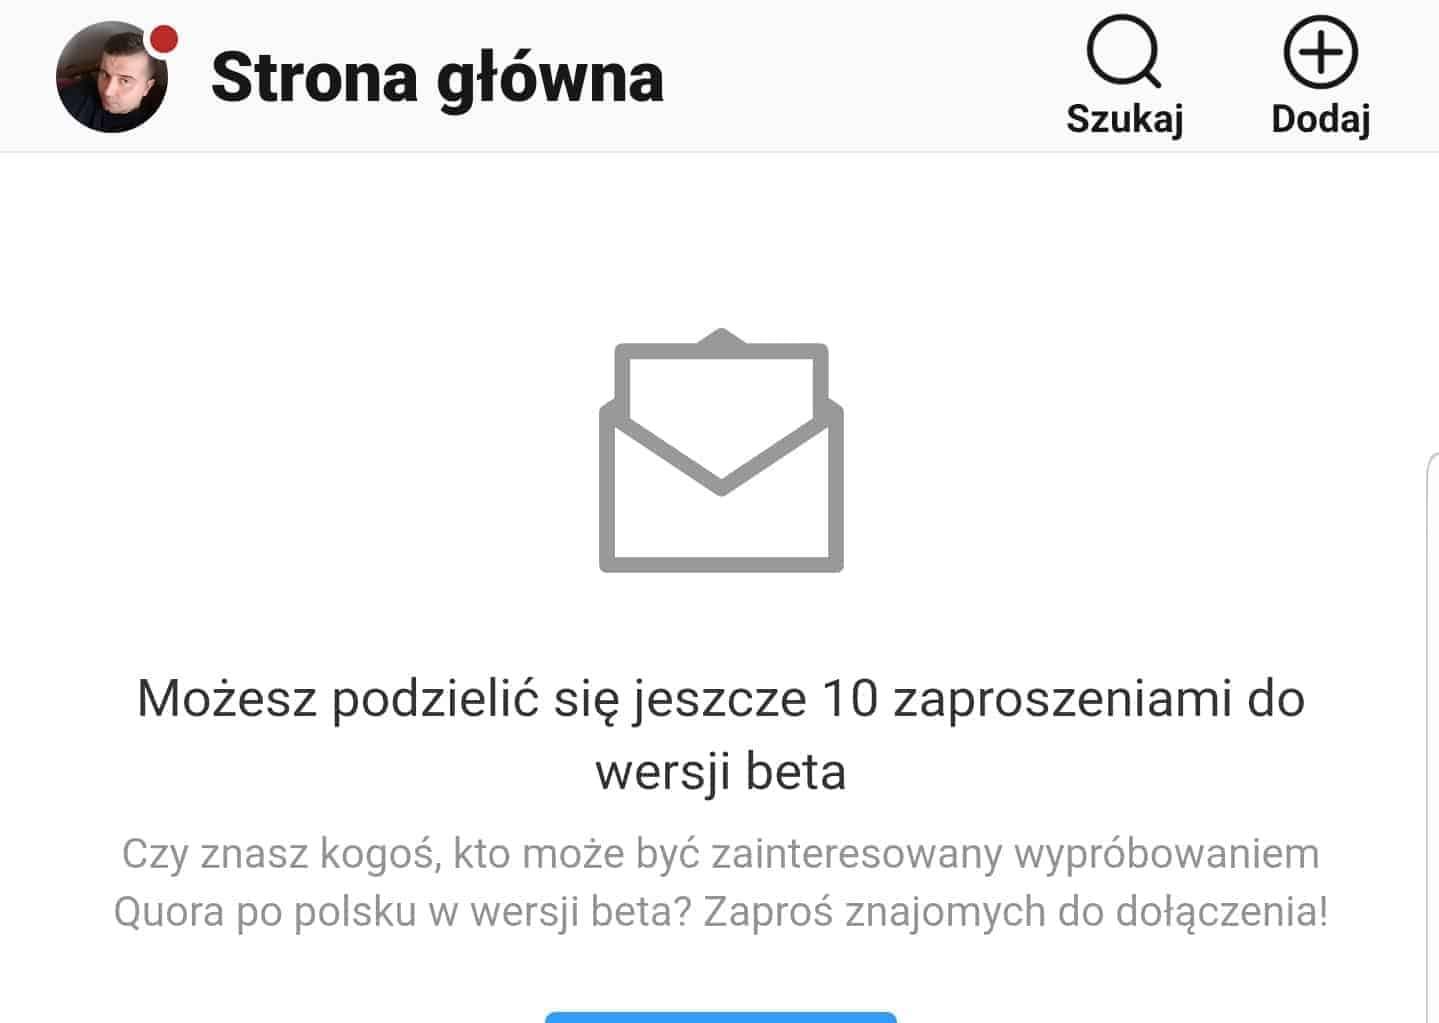 Polska Quora beta zaproszenie